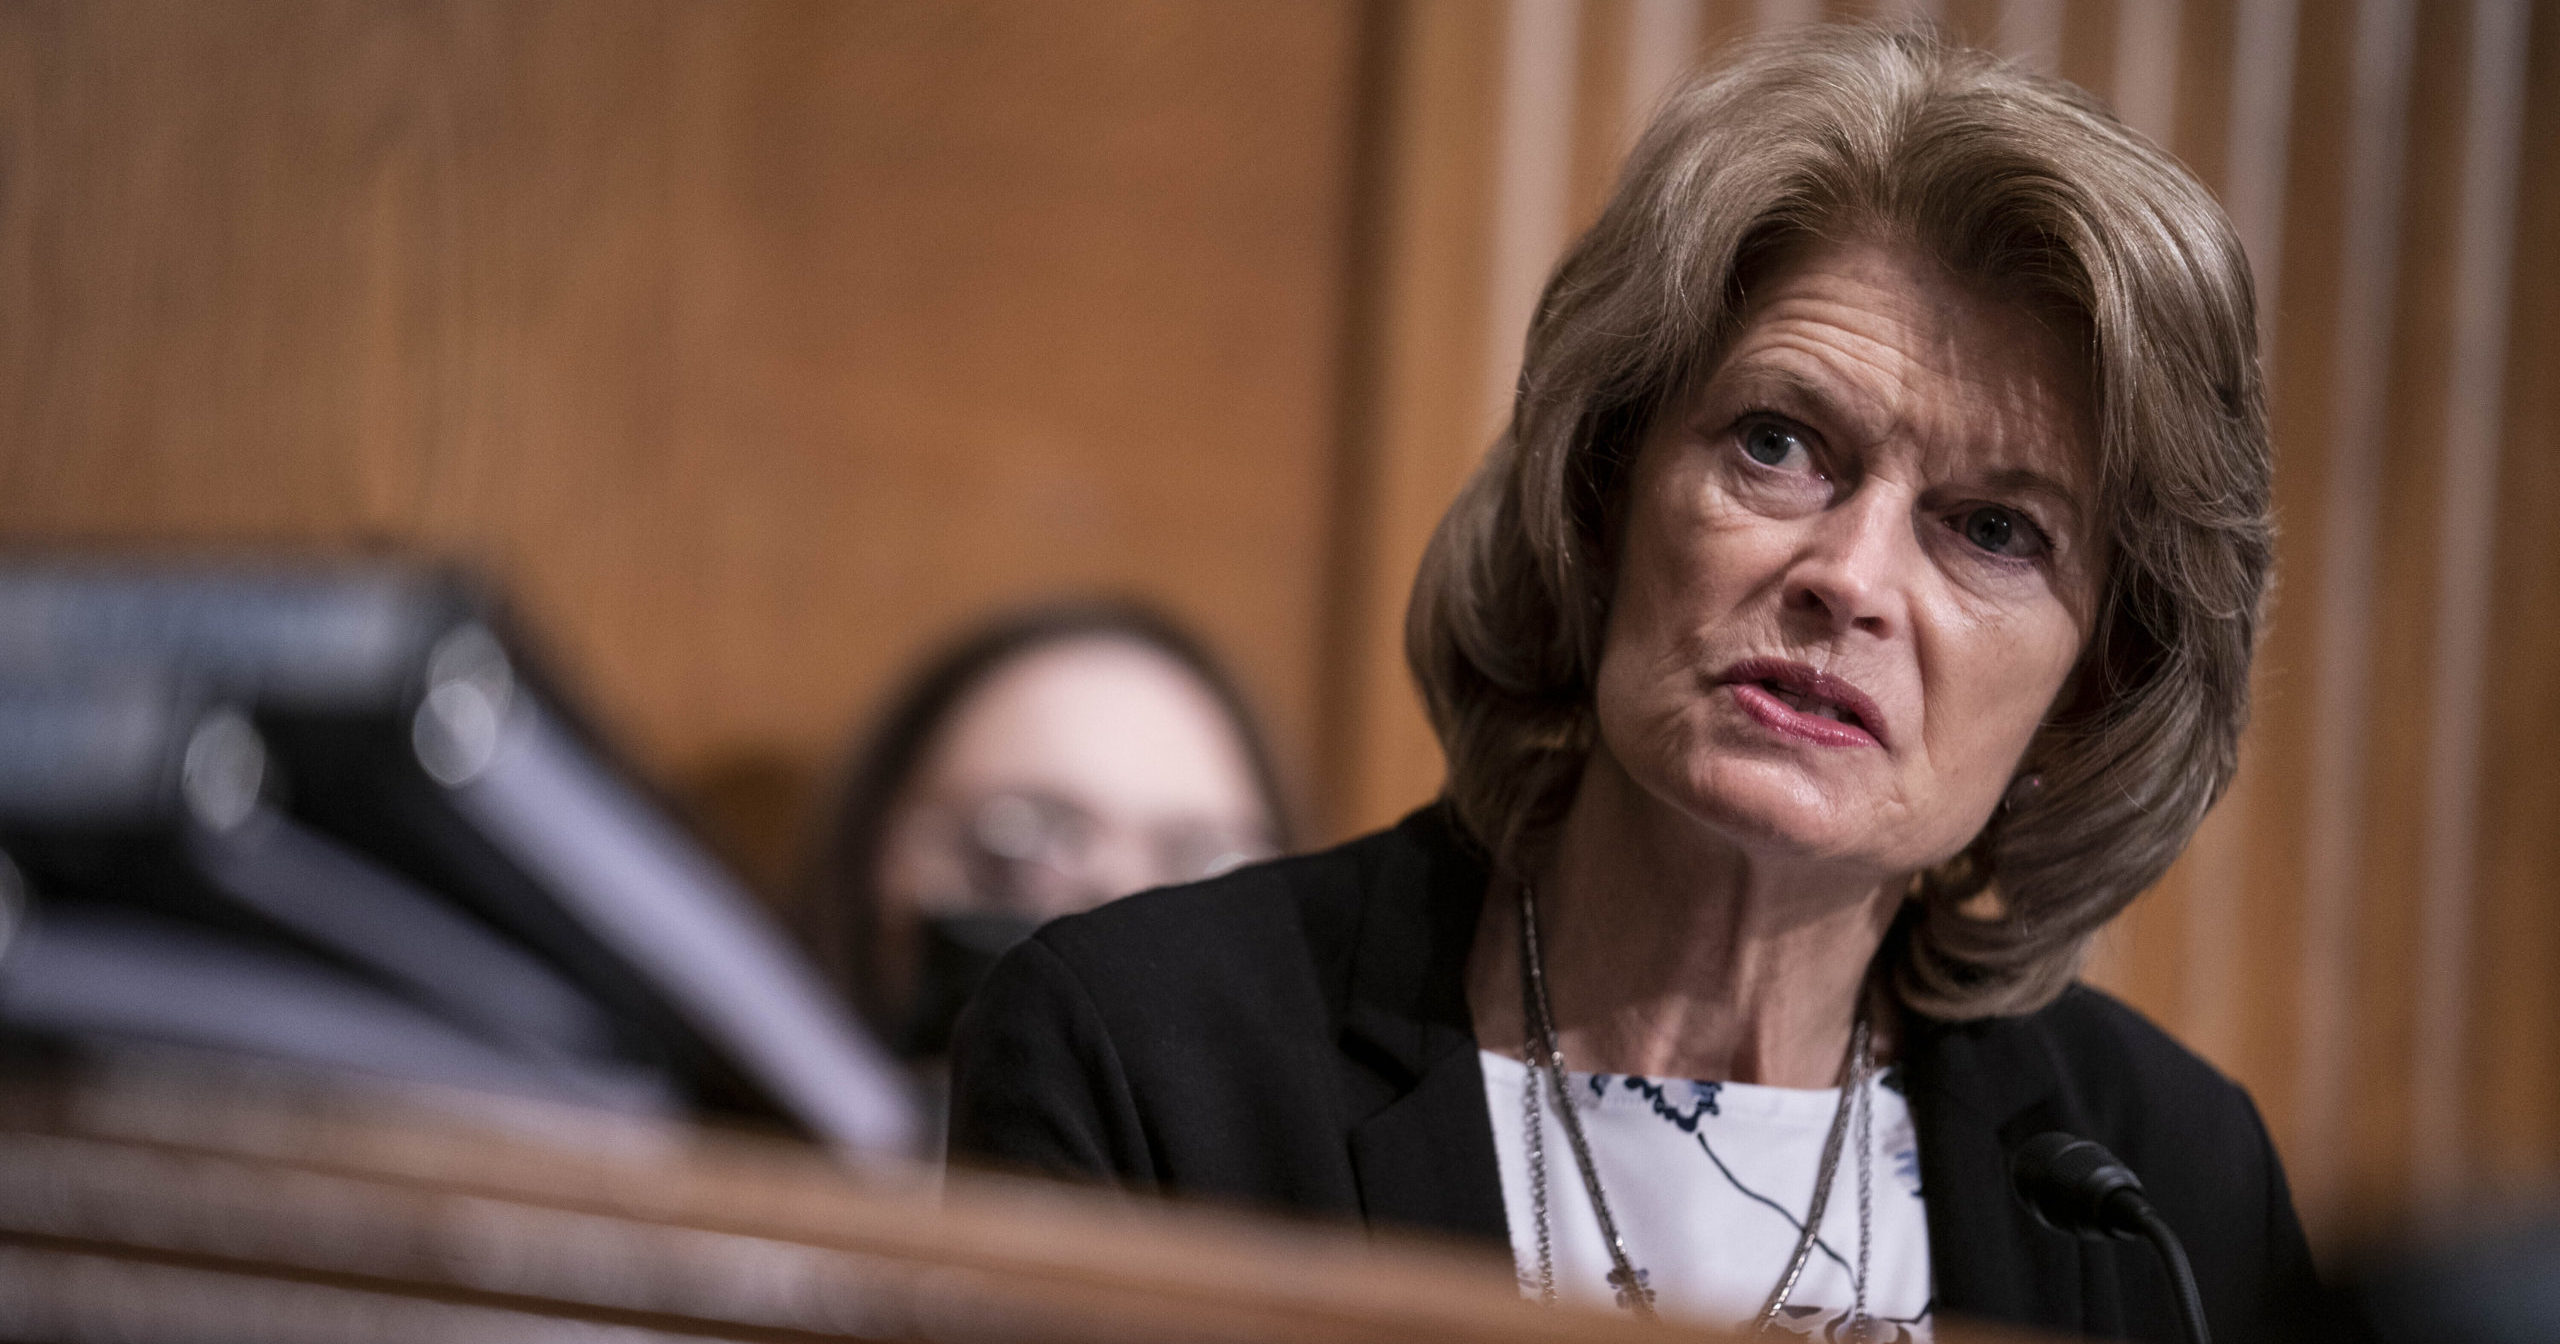 Sen. Lisa Murkowski of Alaska speaks during a hearing on Capitol Hill in Washington, D.C., on Feb. 23, 2021.